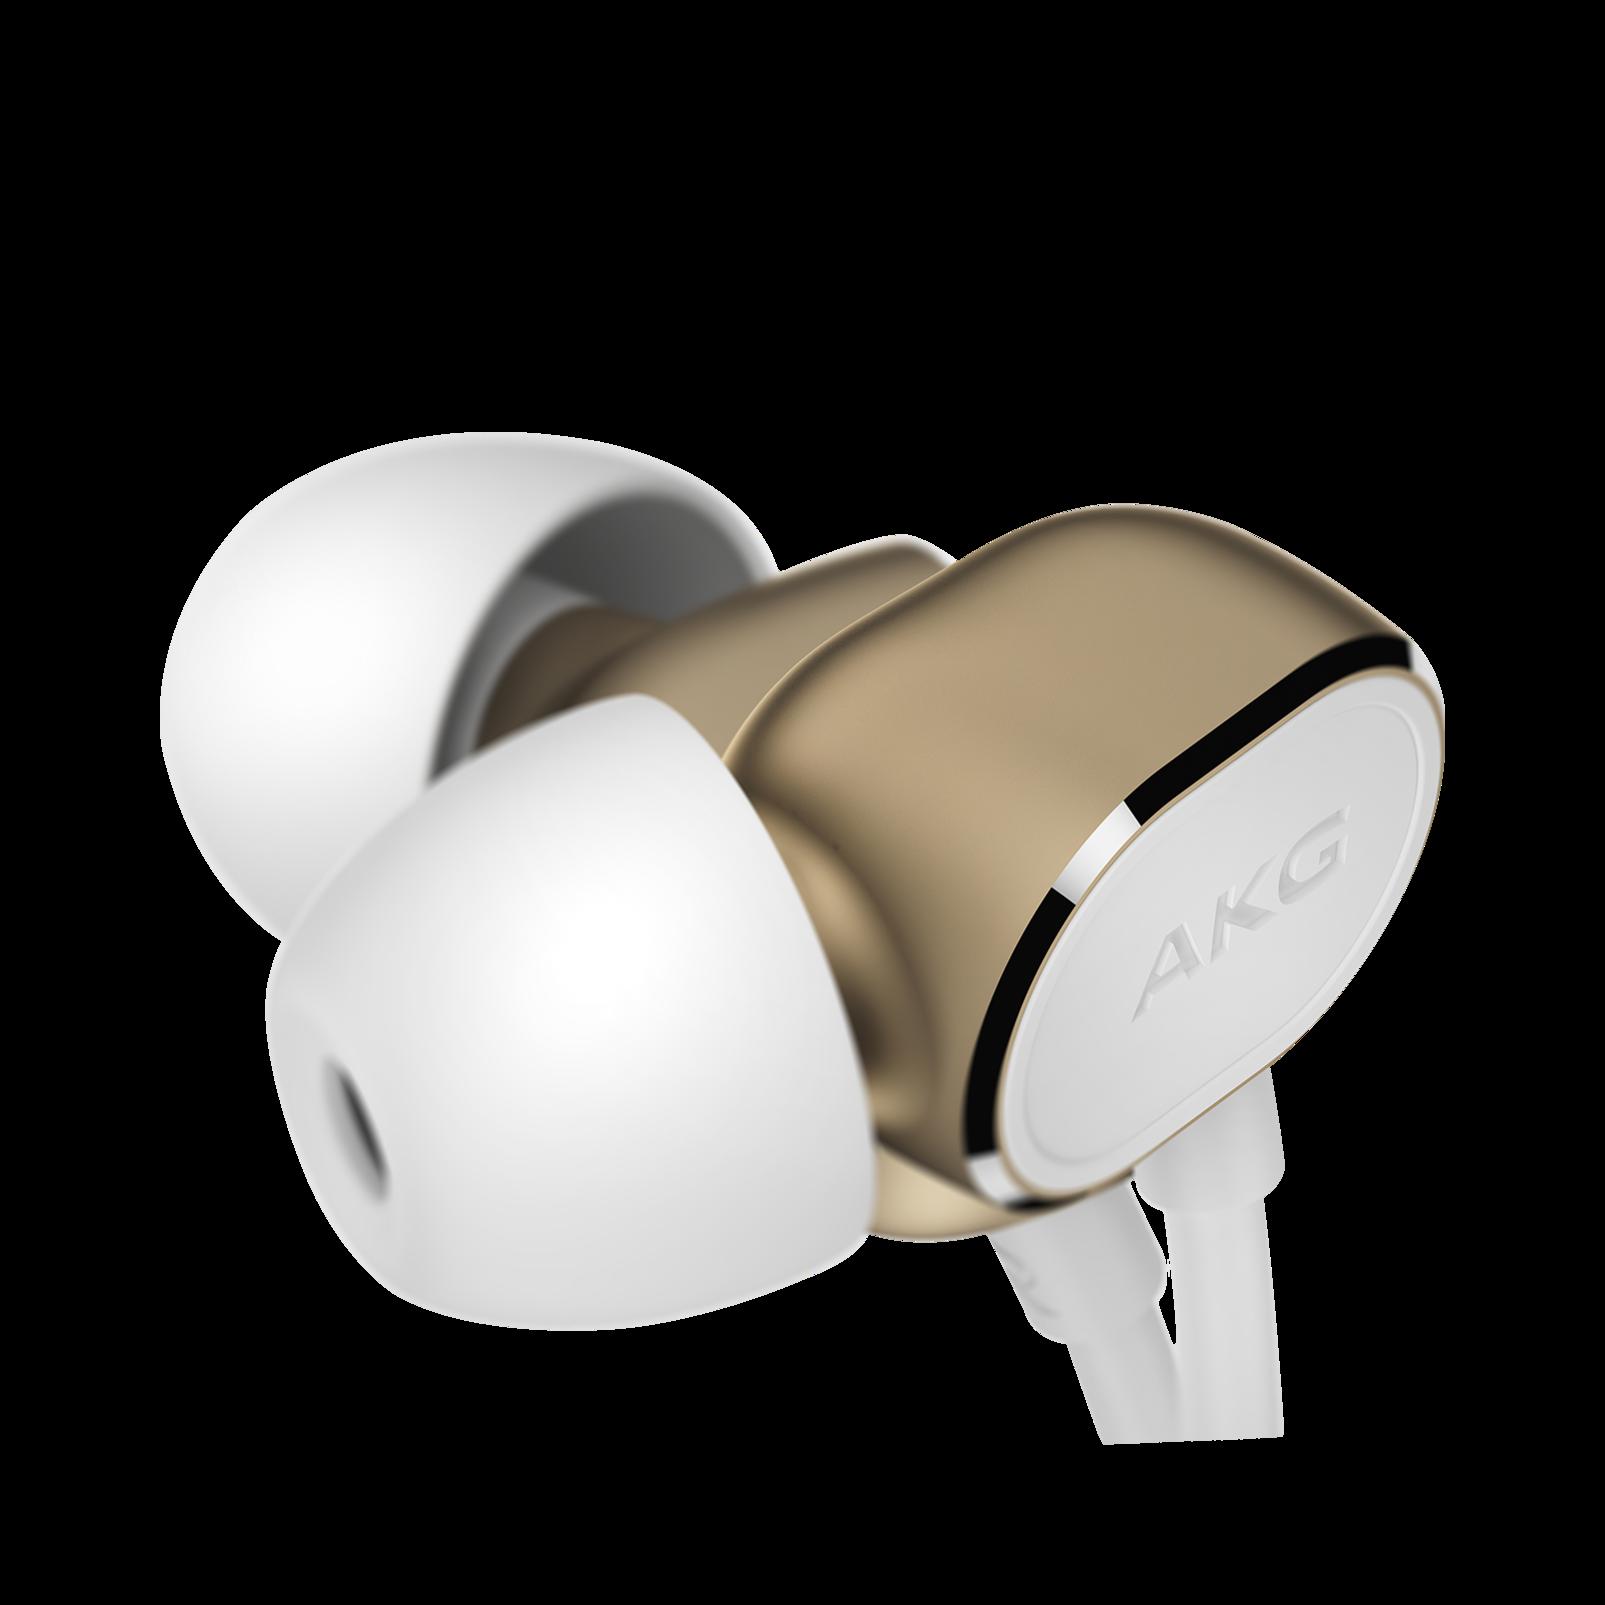 N20 - Gold - Reference class in-ear headphones in aluminum enclousure - Detailshot 2